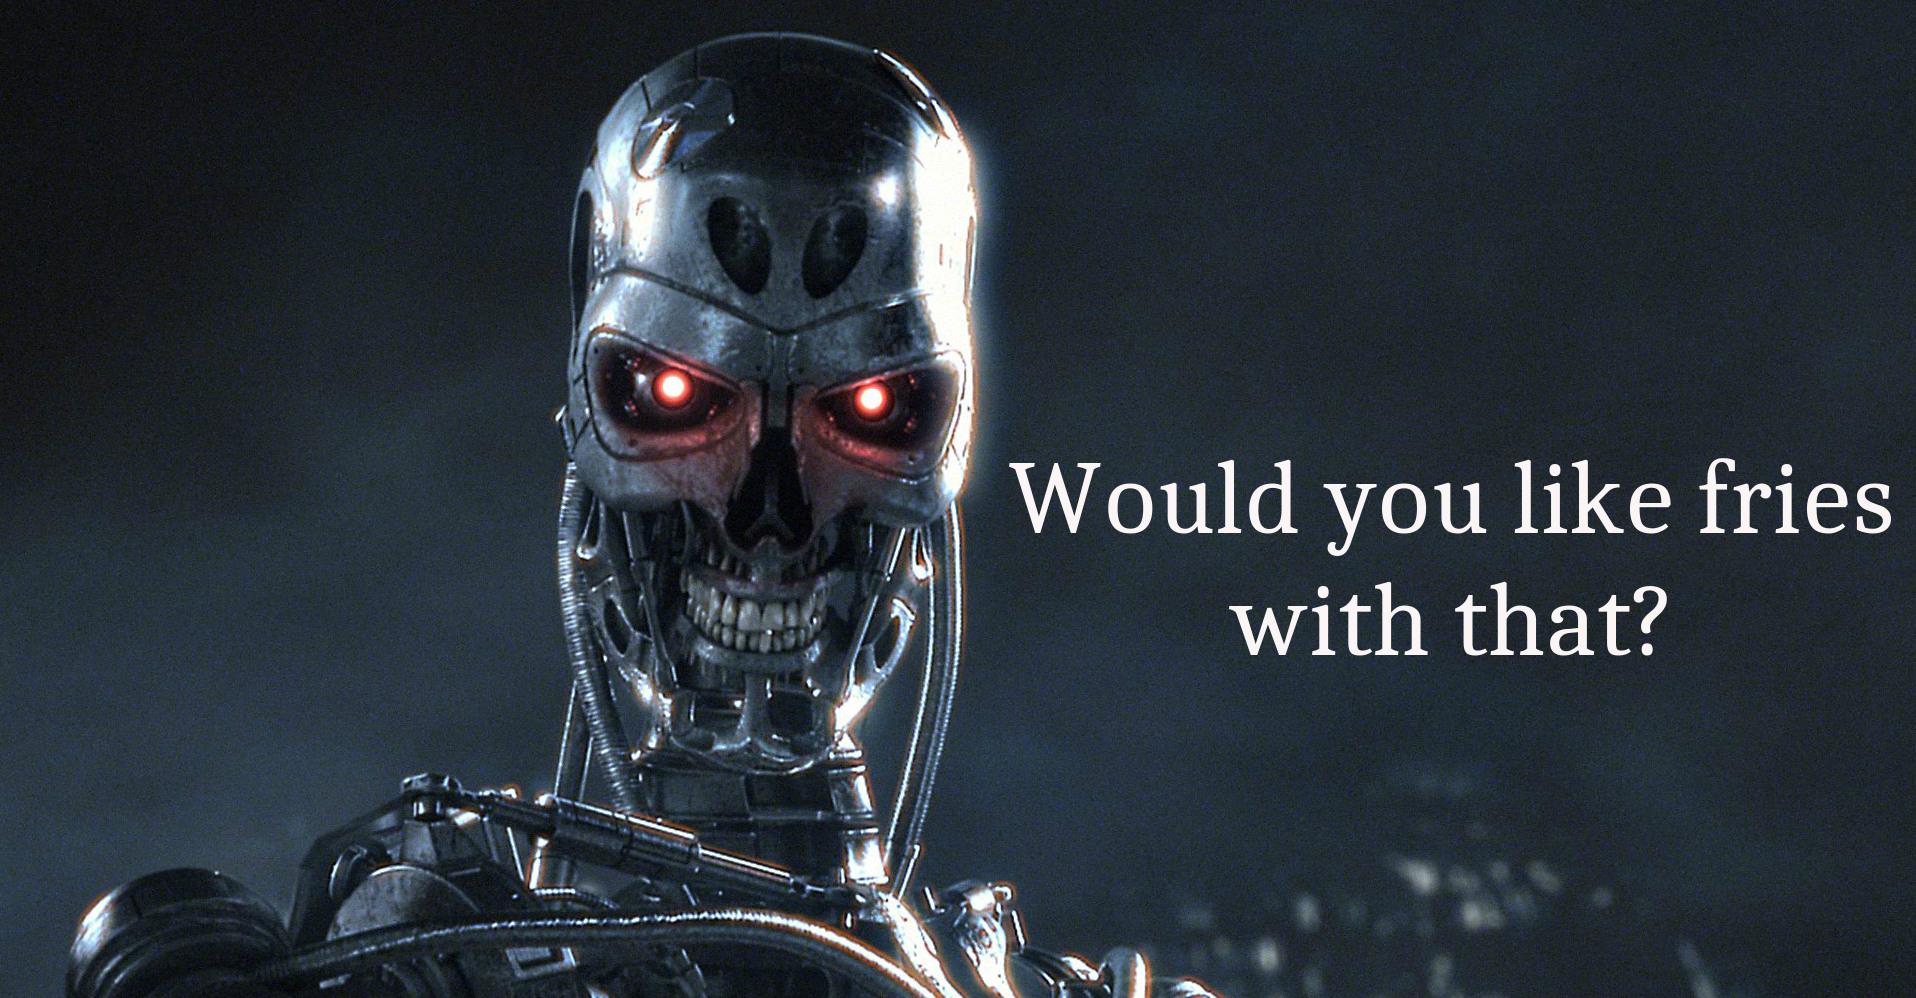 Terminator-Wallpaper-1920x1080-1